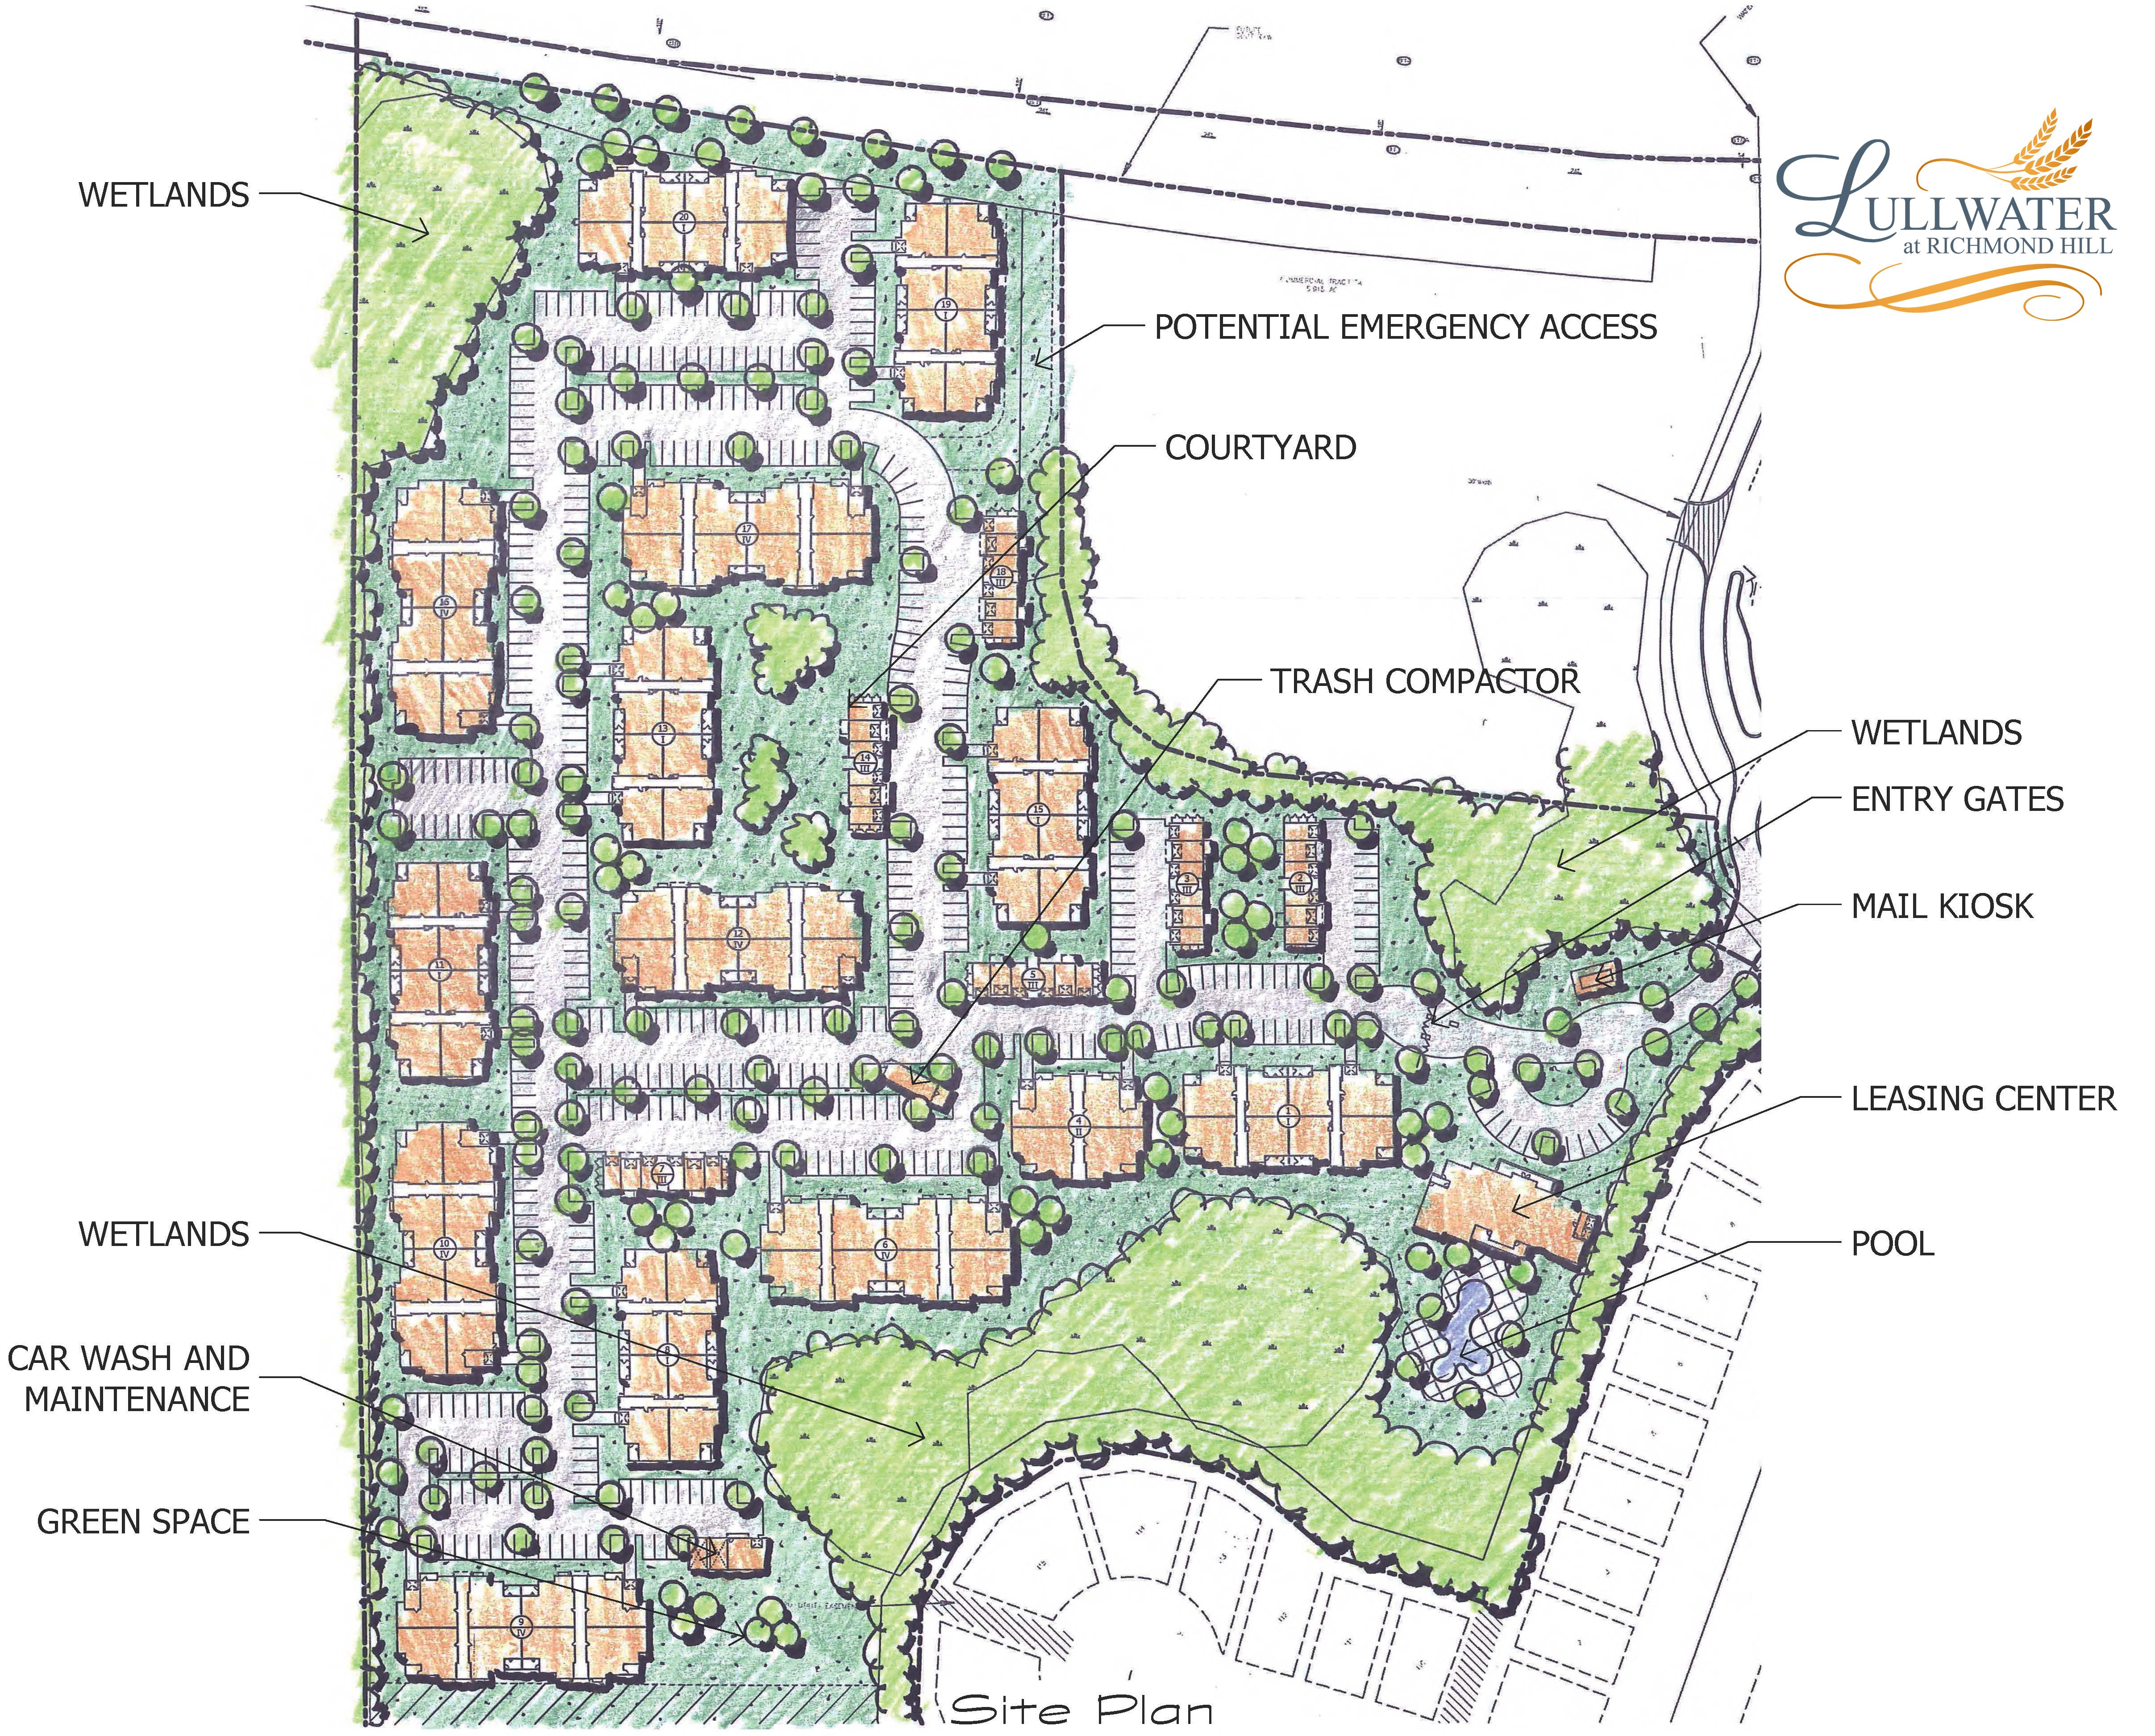 New Luxury Apartment Community To Begin Development In Richmond Hill Ga Press Release